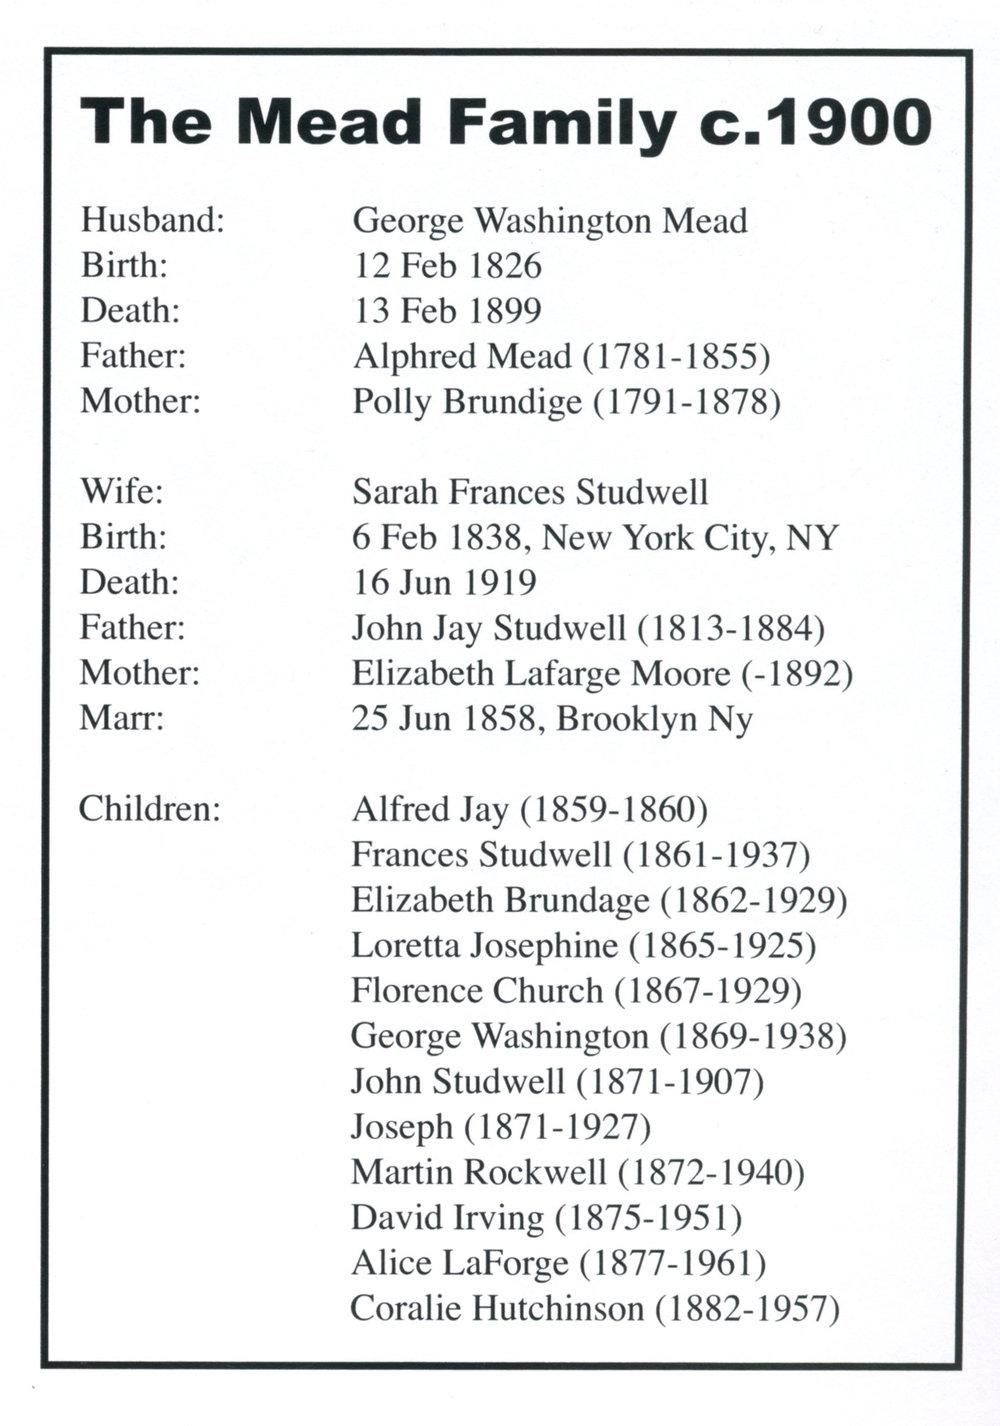 mead family 1900.jpg